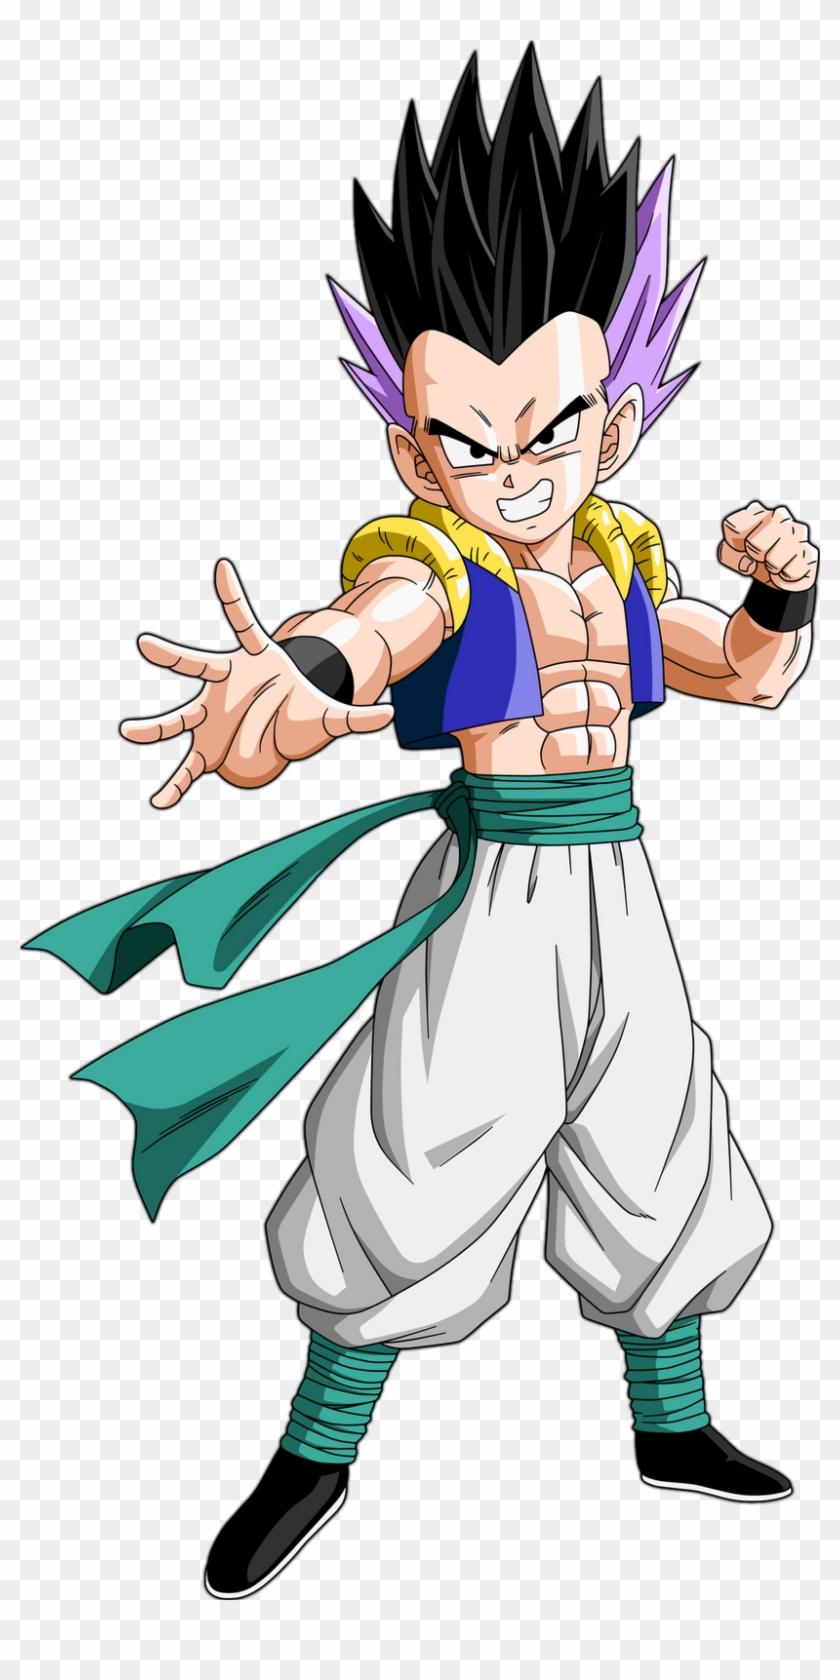 Gotenks - Dragon Ball Z Goten And Trunks Fusion - Free ...